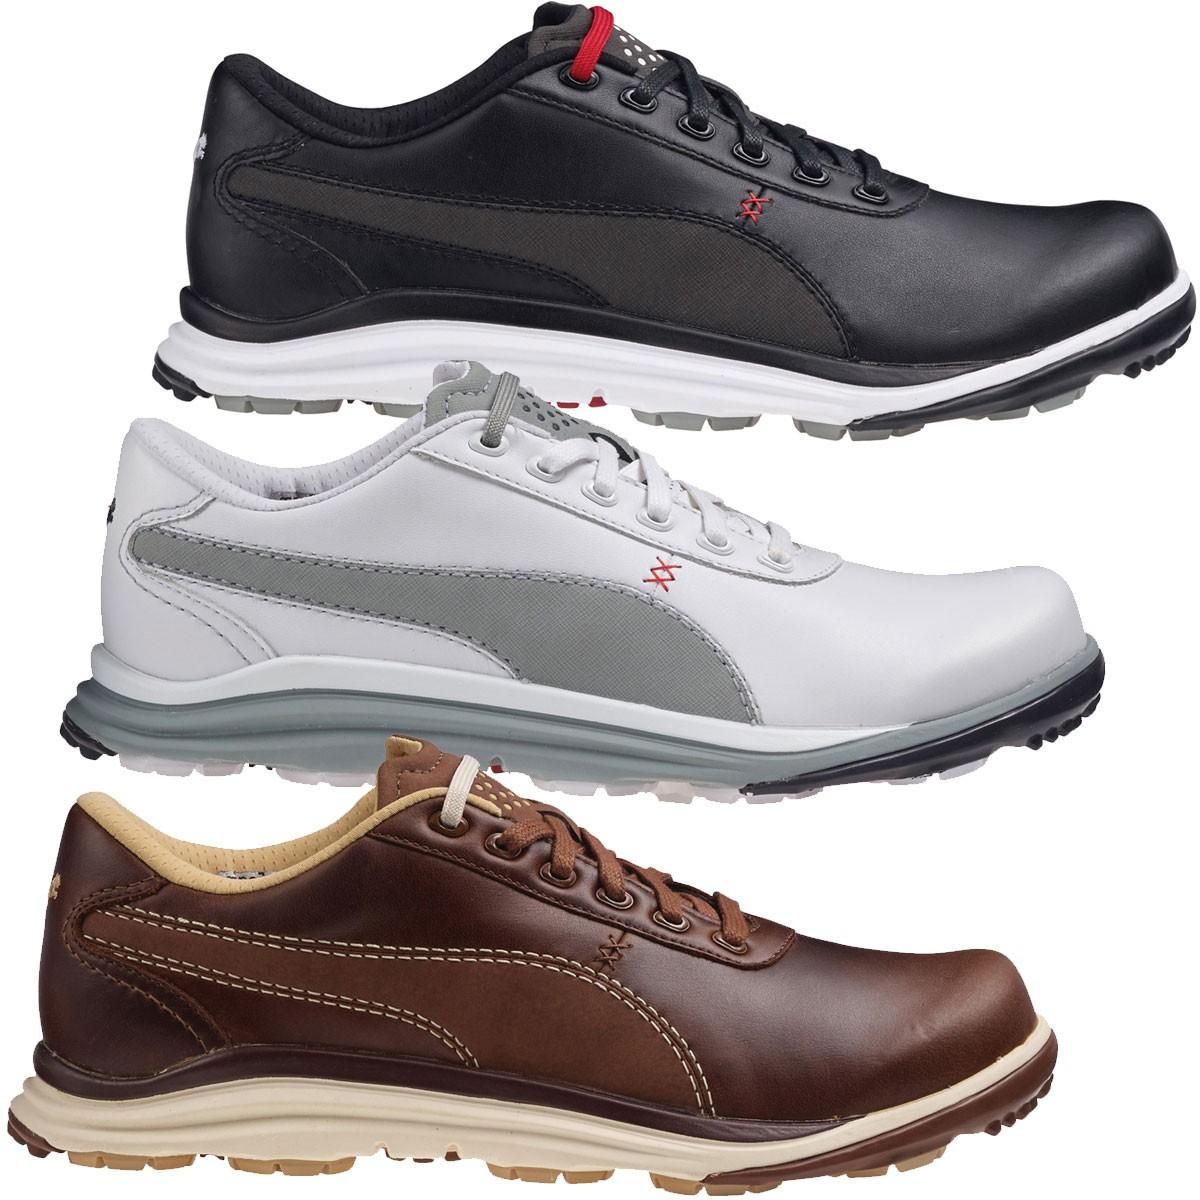 e7a8967804b66e ... Puma Golf Mens BioDrive Spikeless Waterproof Leather Golf Shoes.    Back. 188337 188202